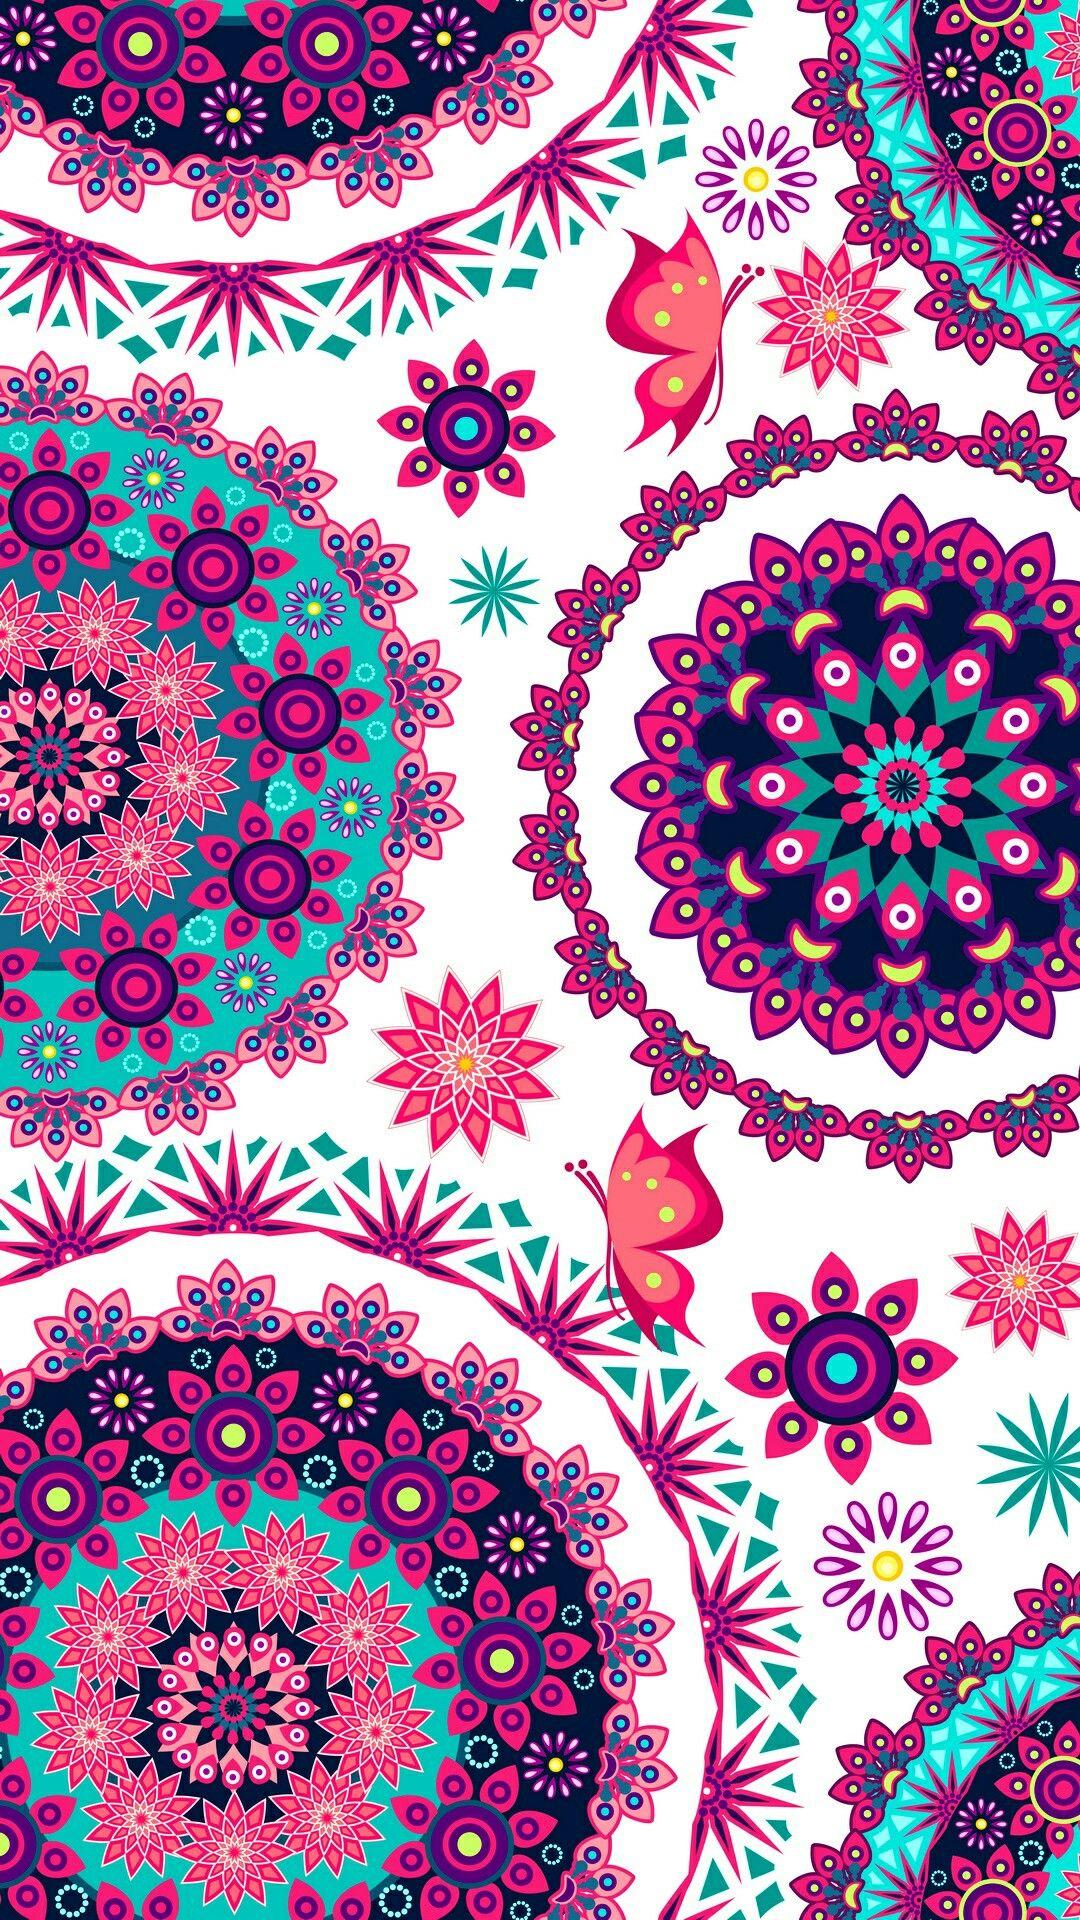 Watercolor Floral C Taylor Bates Hand Painted Wallpaper Pink